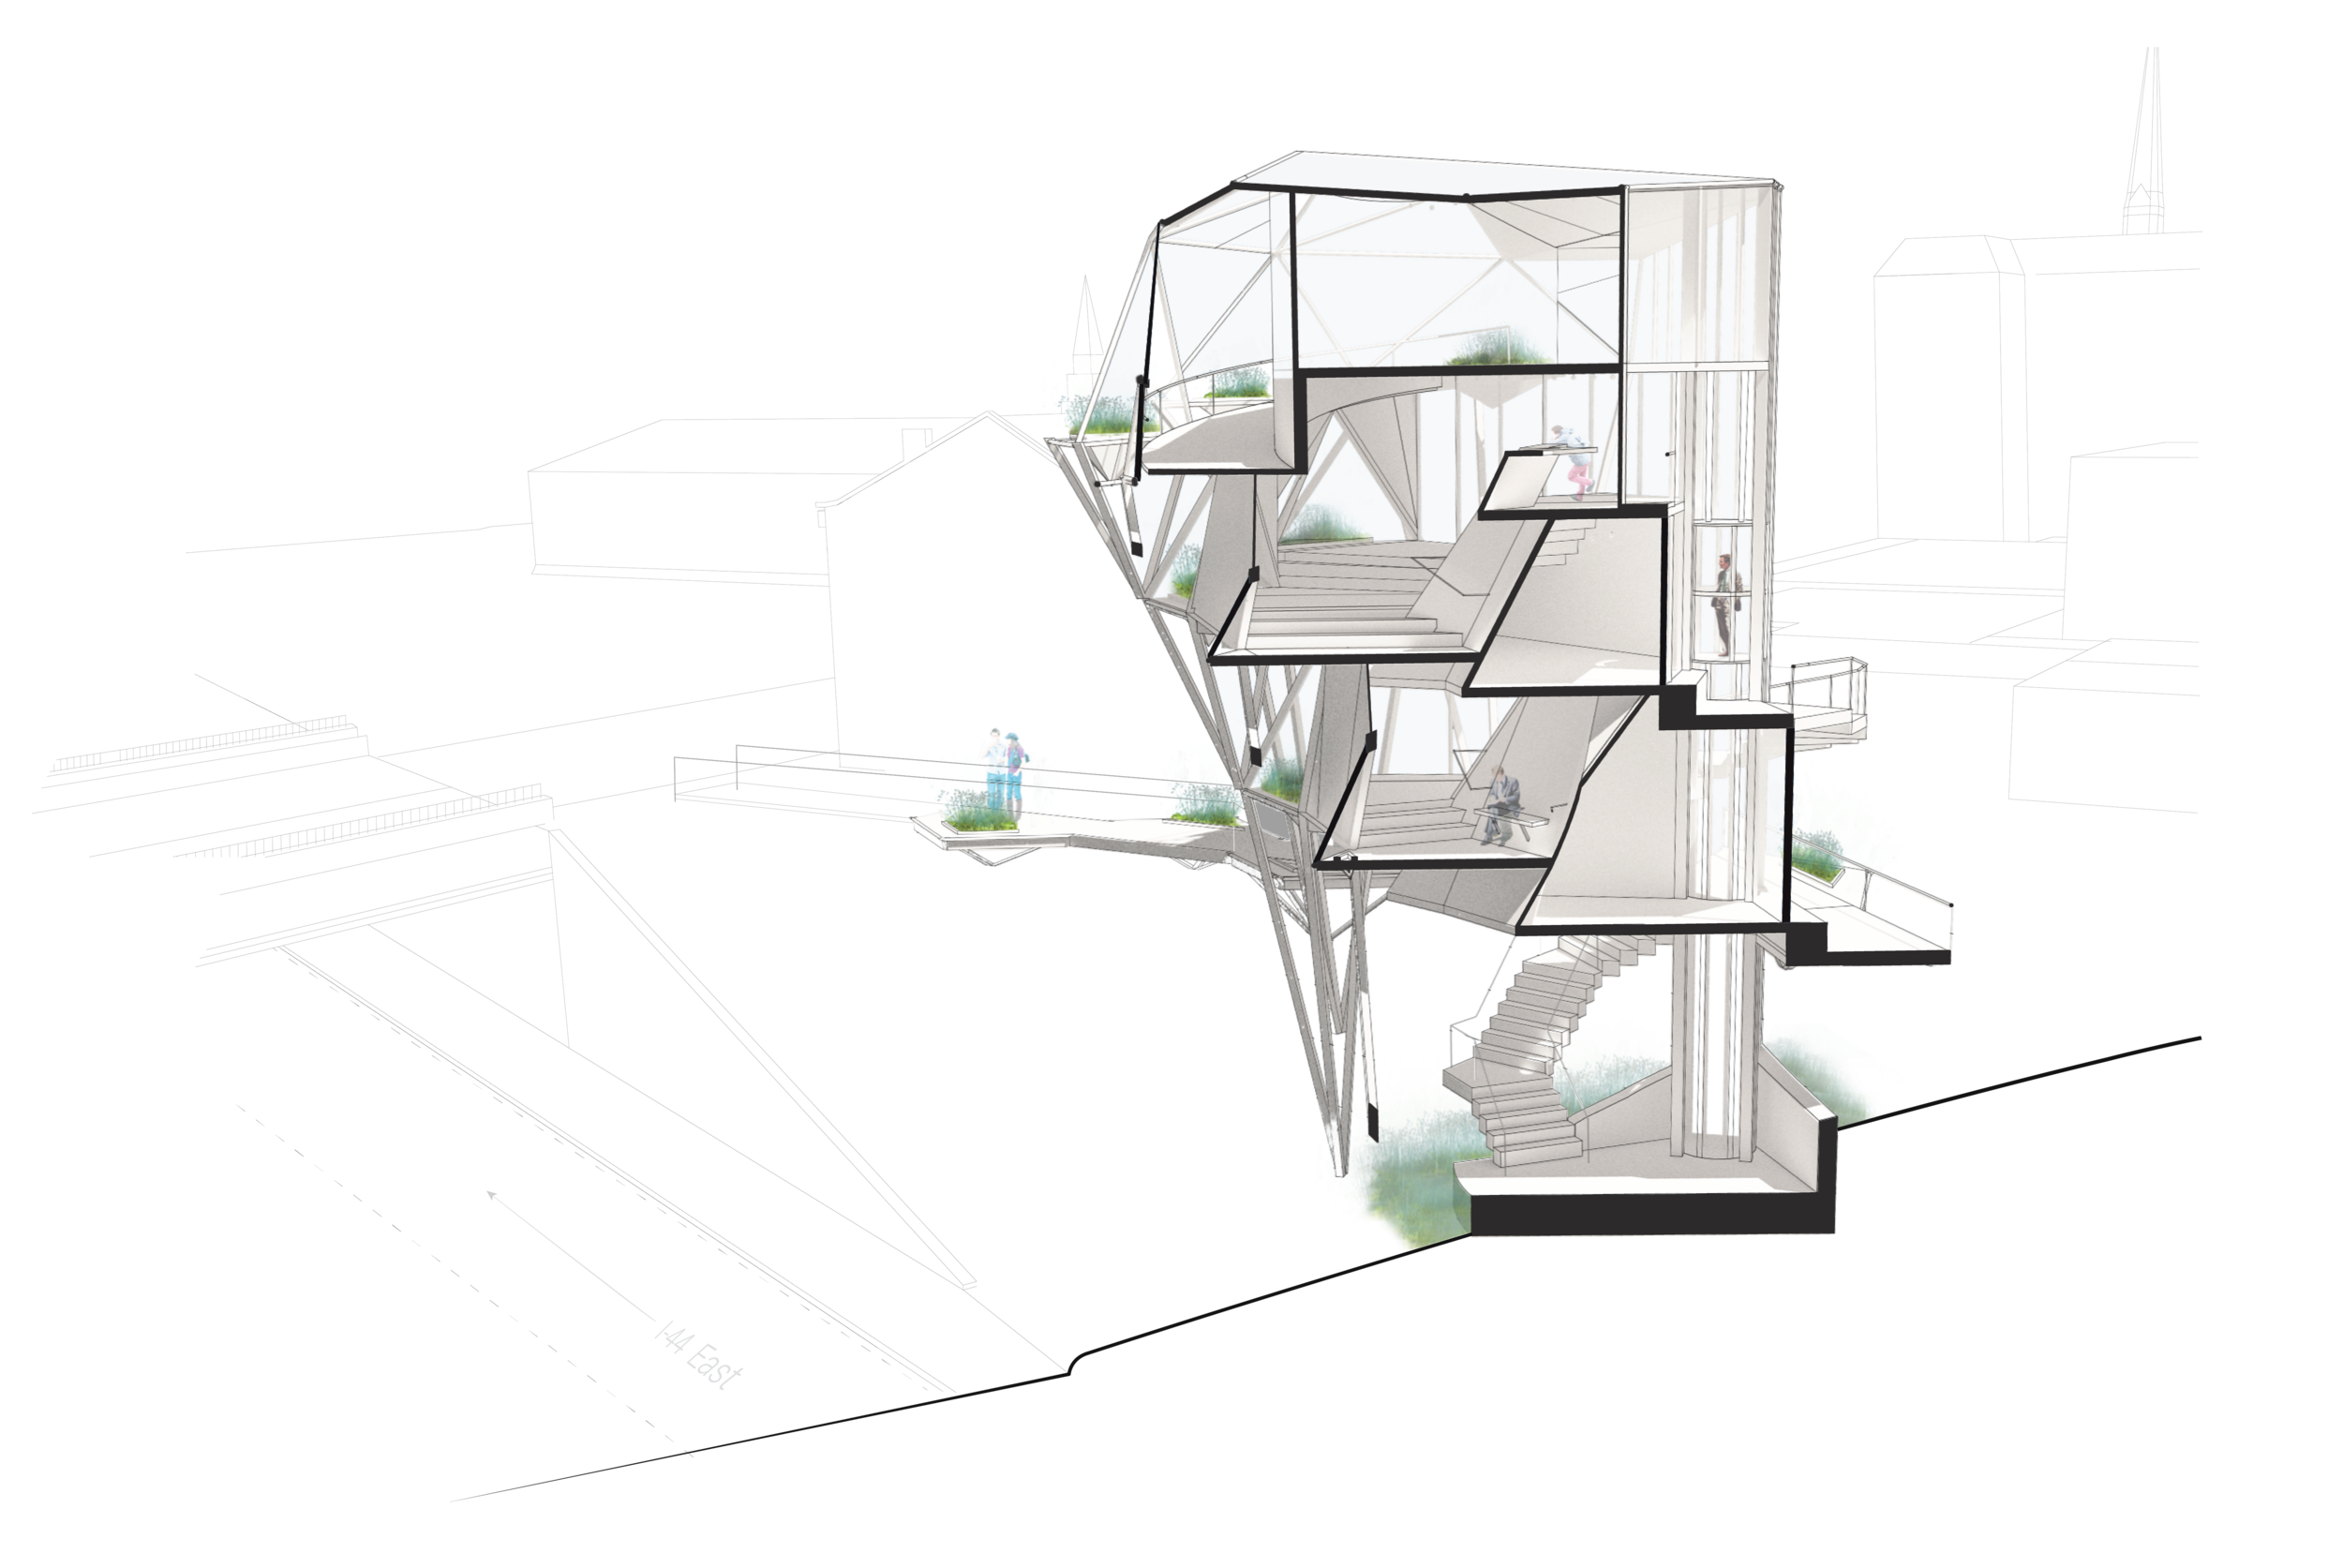 Vertical Greenhouse - WashU Core Studio III - Greenhouse - Soulard, St. Louis, MOpreserving urban ecology2015